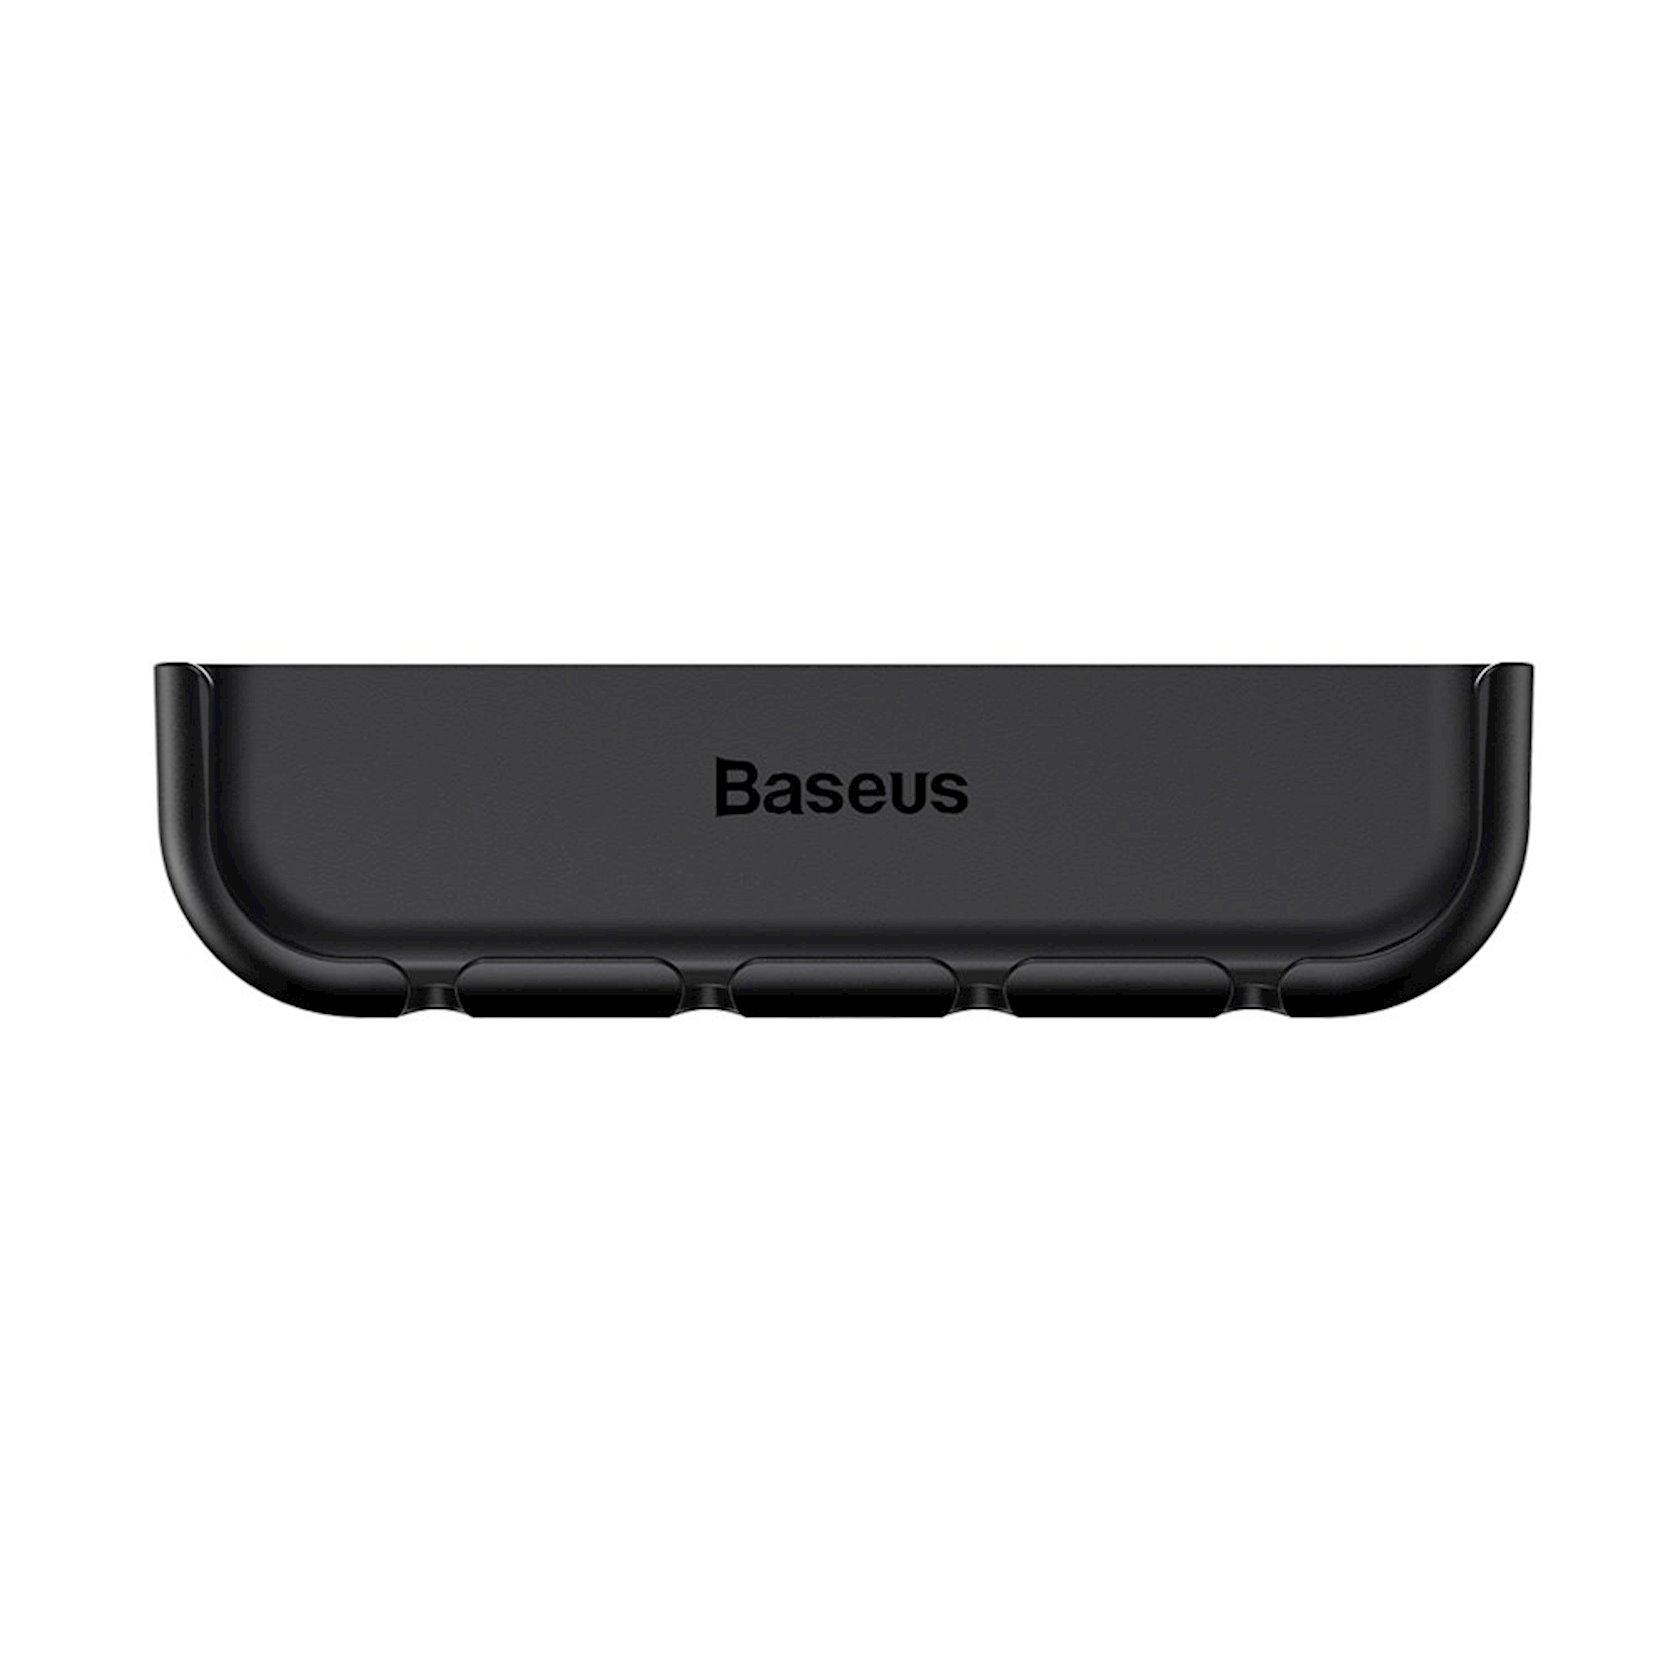 Kabel tutacağı Baseus cable fixing magic tool for pad pasting For iPX/XS 5.8inch, qara